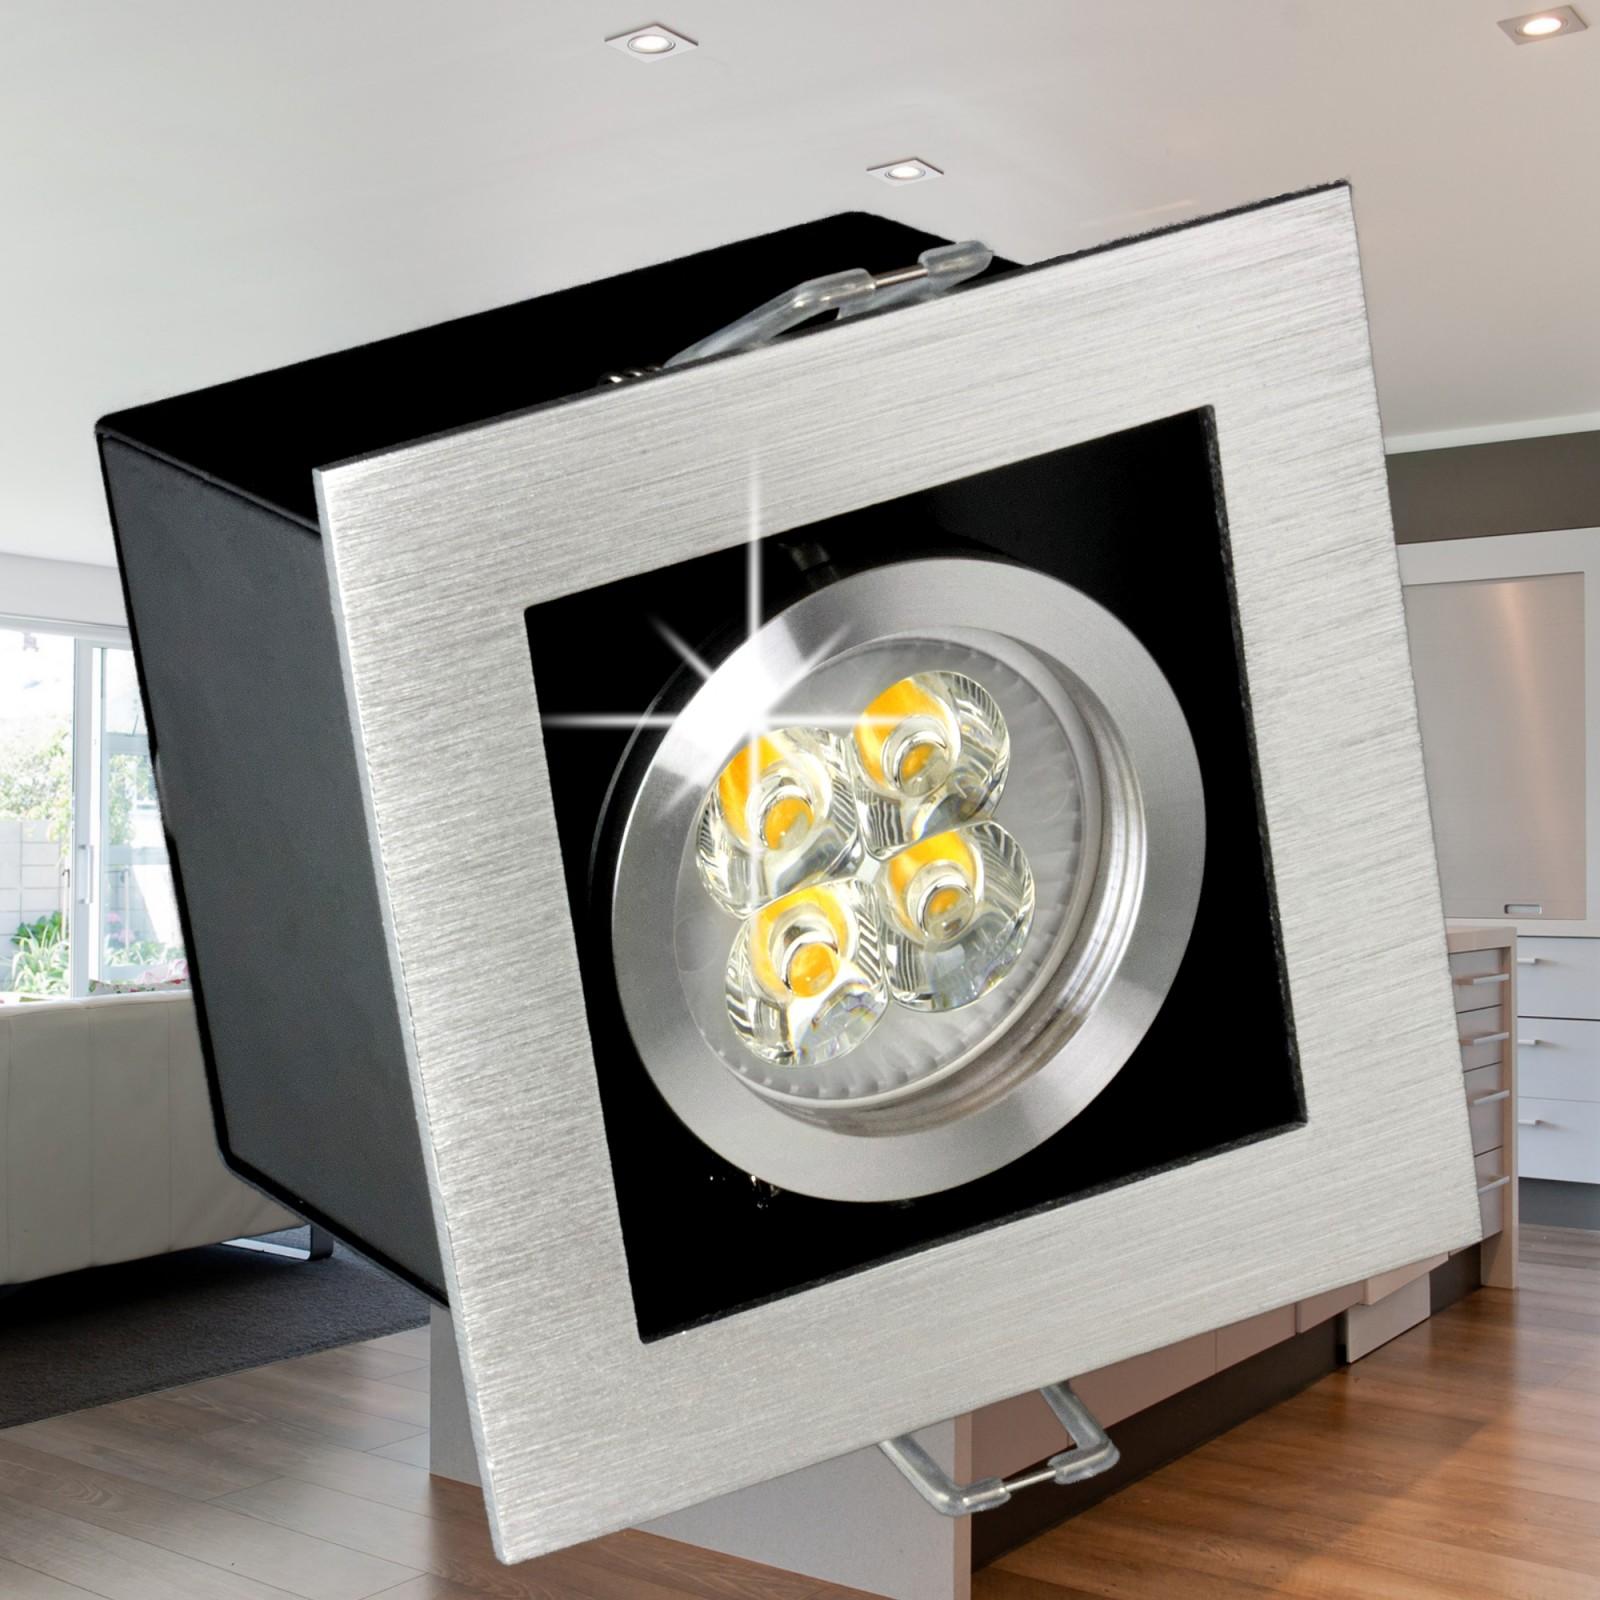 k1 alu led einbaustrahler leuchte kardanisch dimmbar. Black Bedroom Furniture Sets. Home Design Ideas